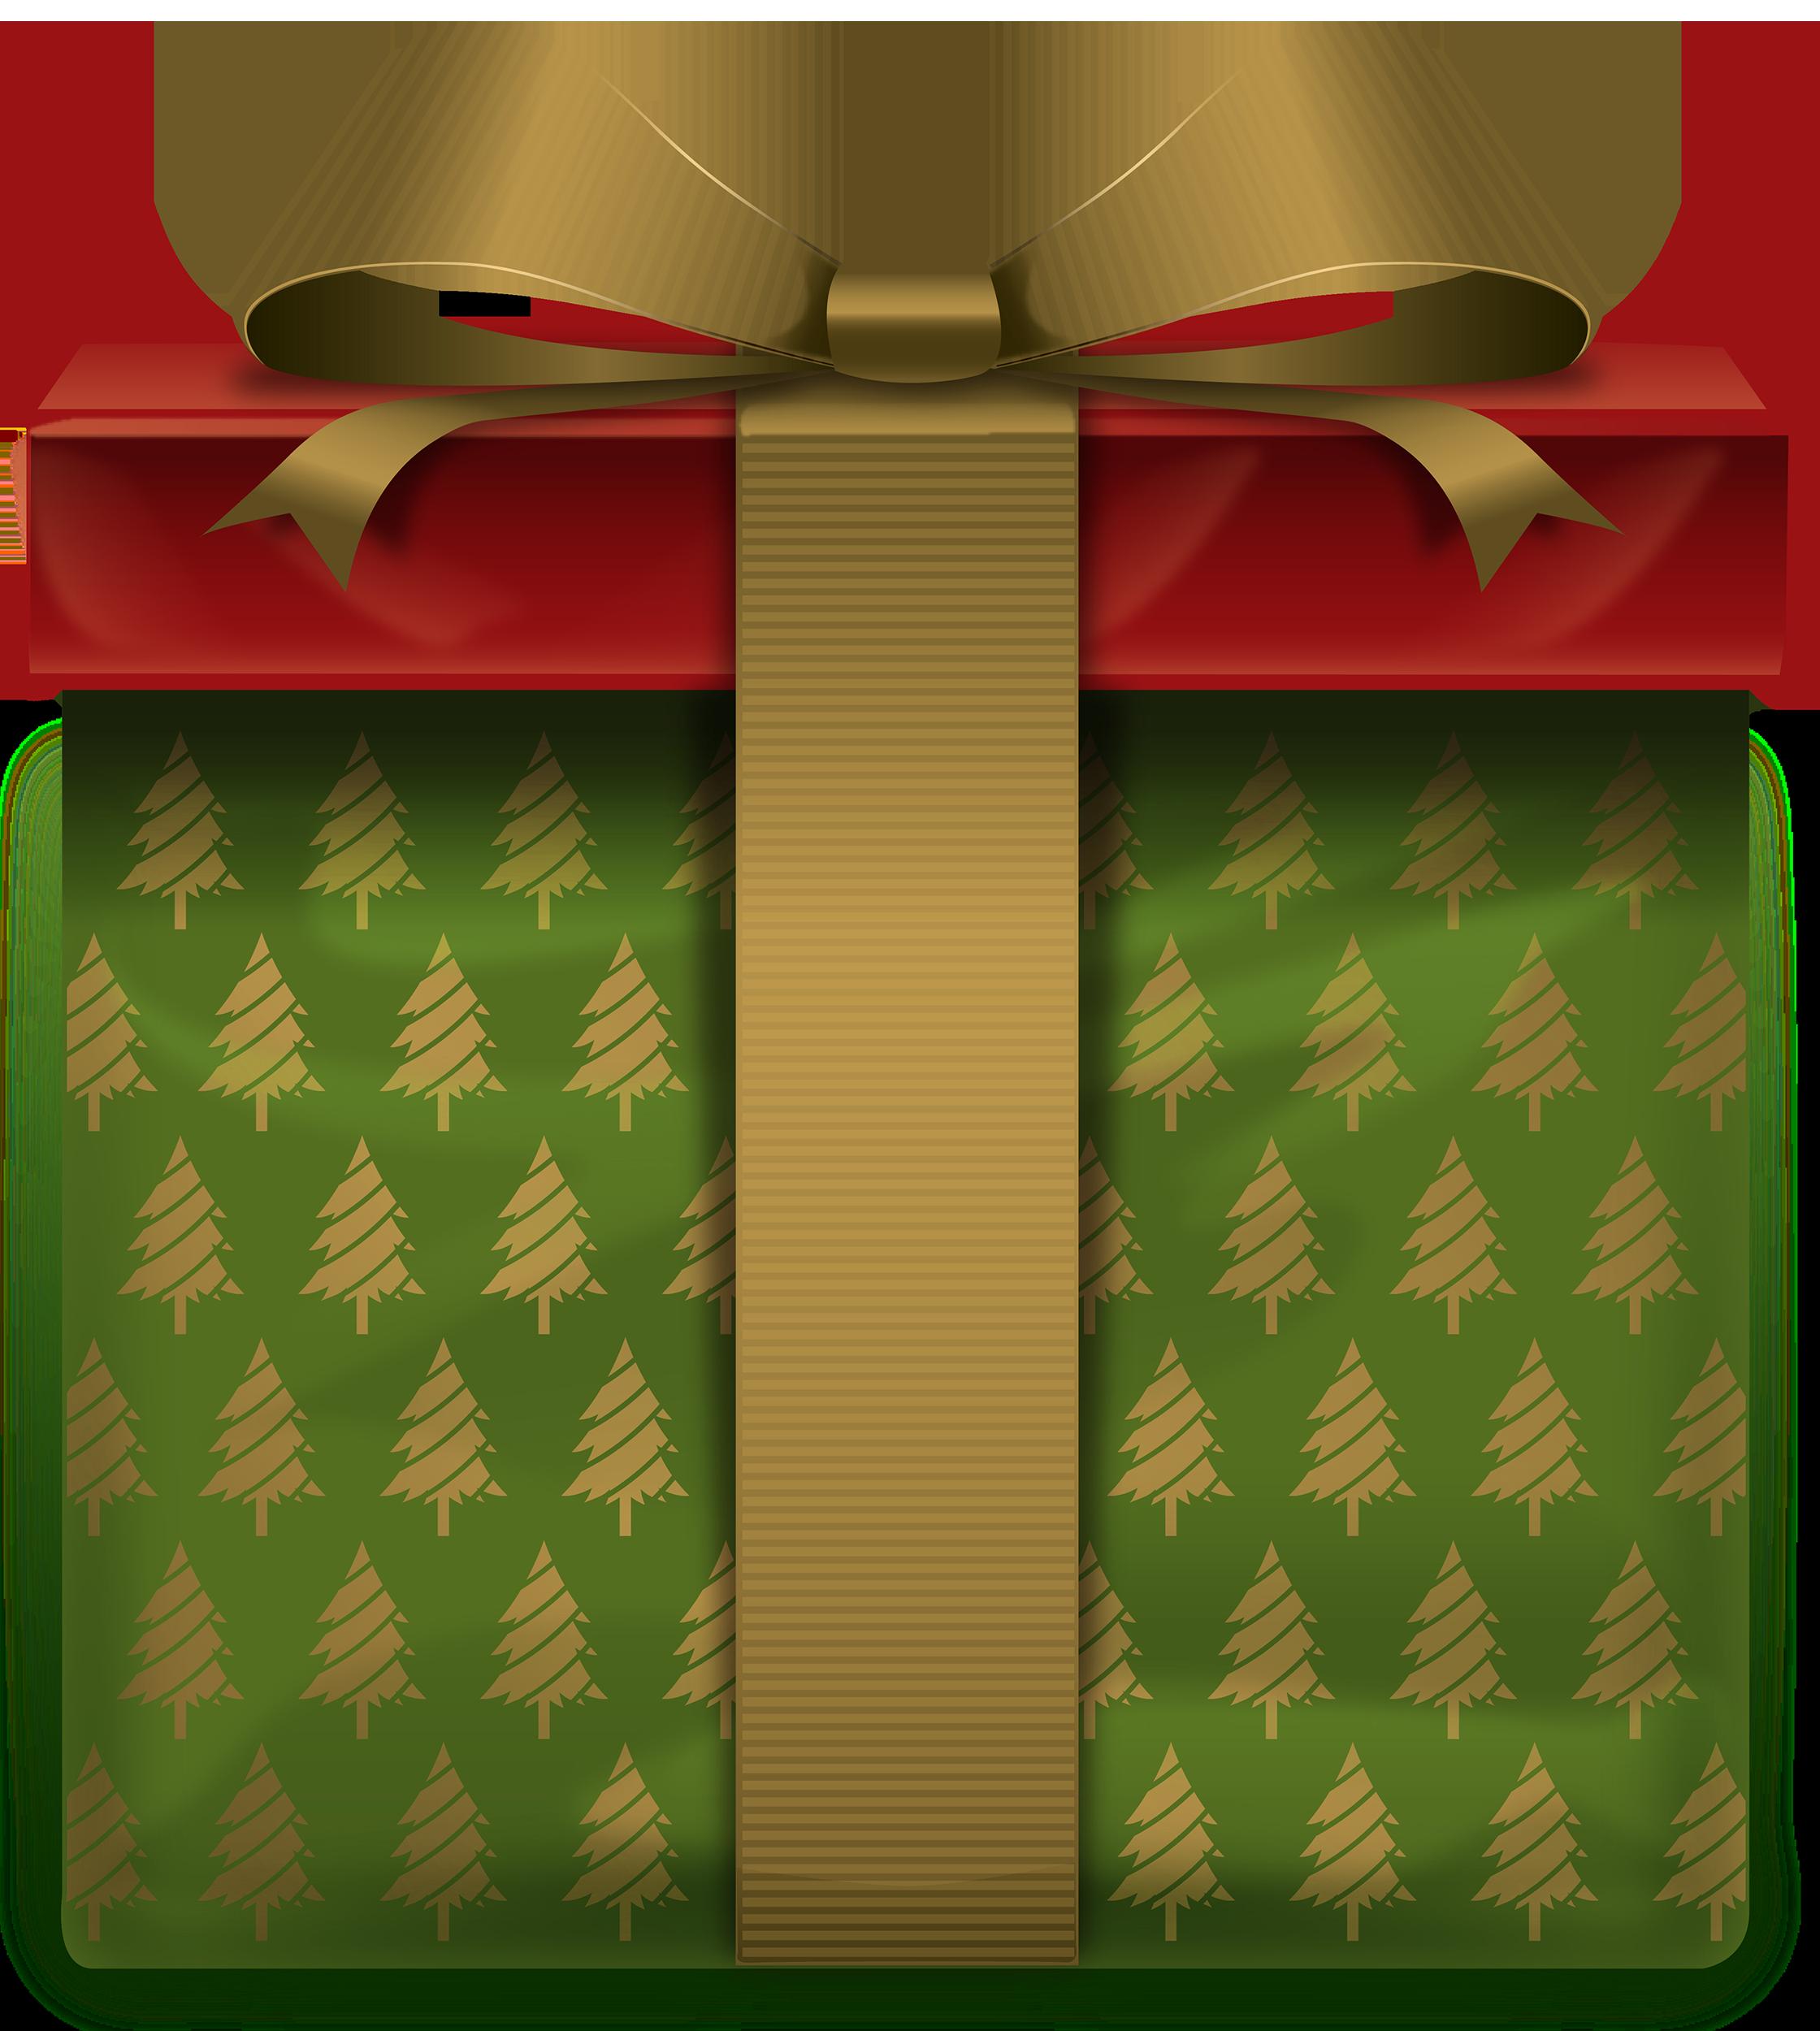 Christmas png best web. Clipart present hanukkah presents